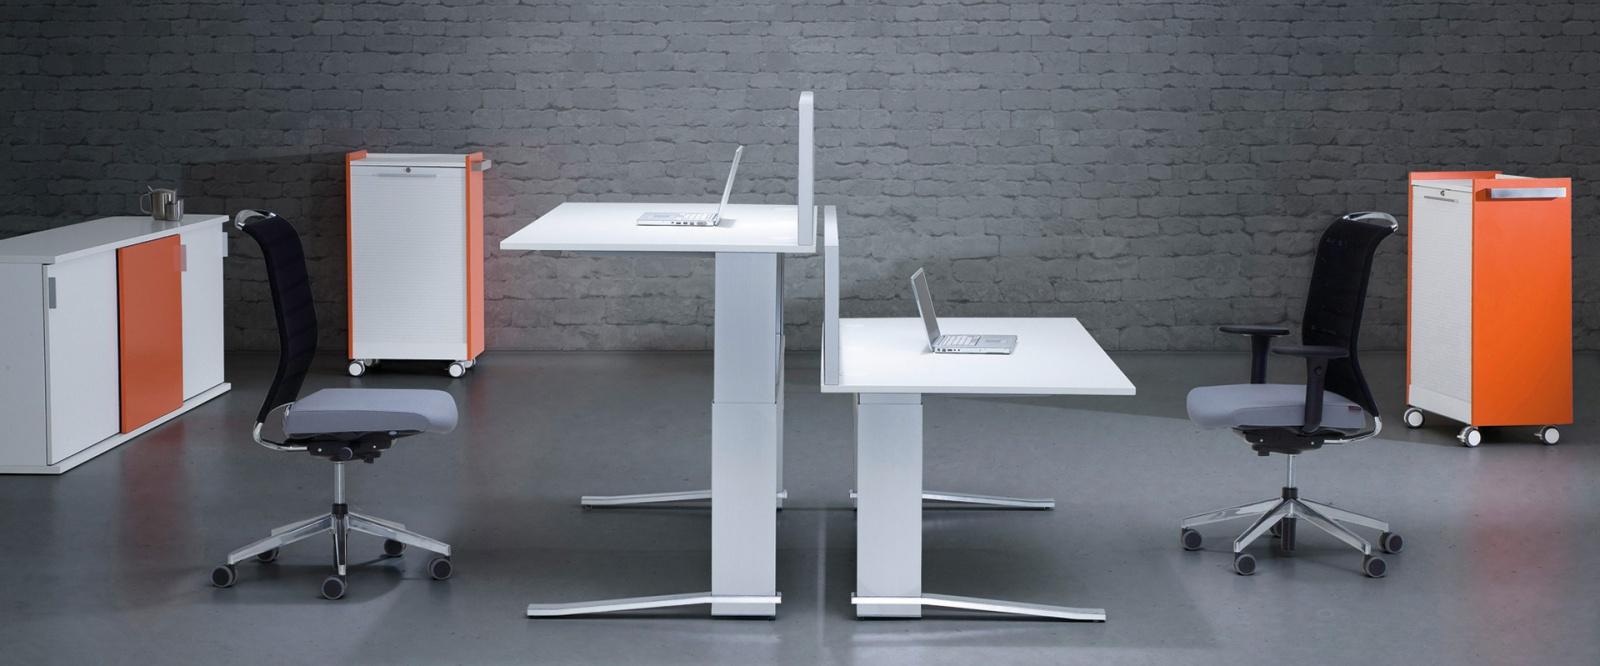 ergonomie im b ro hamburg ergonomische b roarbeitspl tze bk. Black Bedroom Furniture Sets. Home Design Ideas